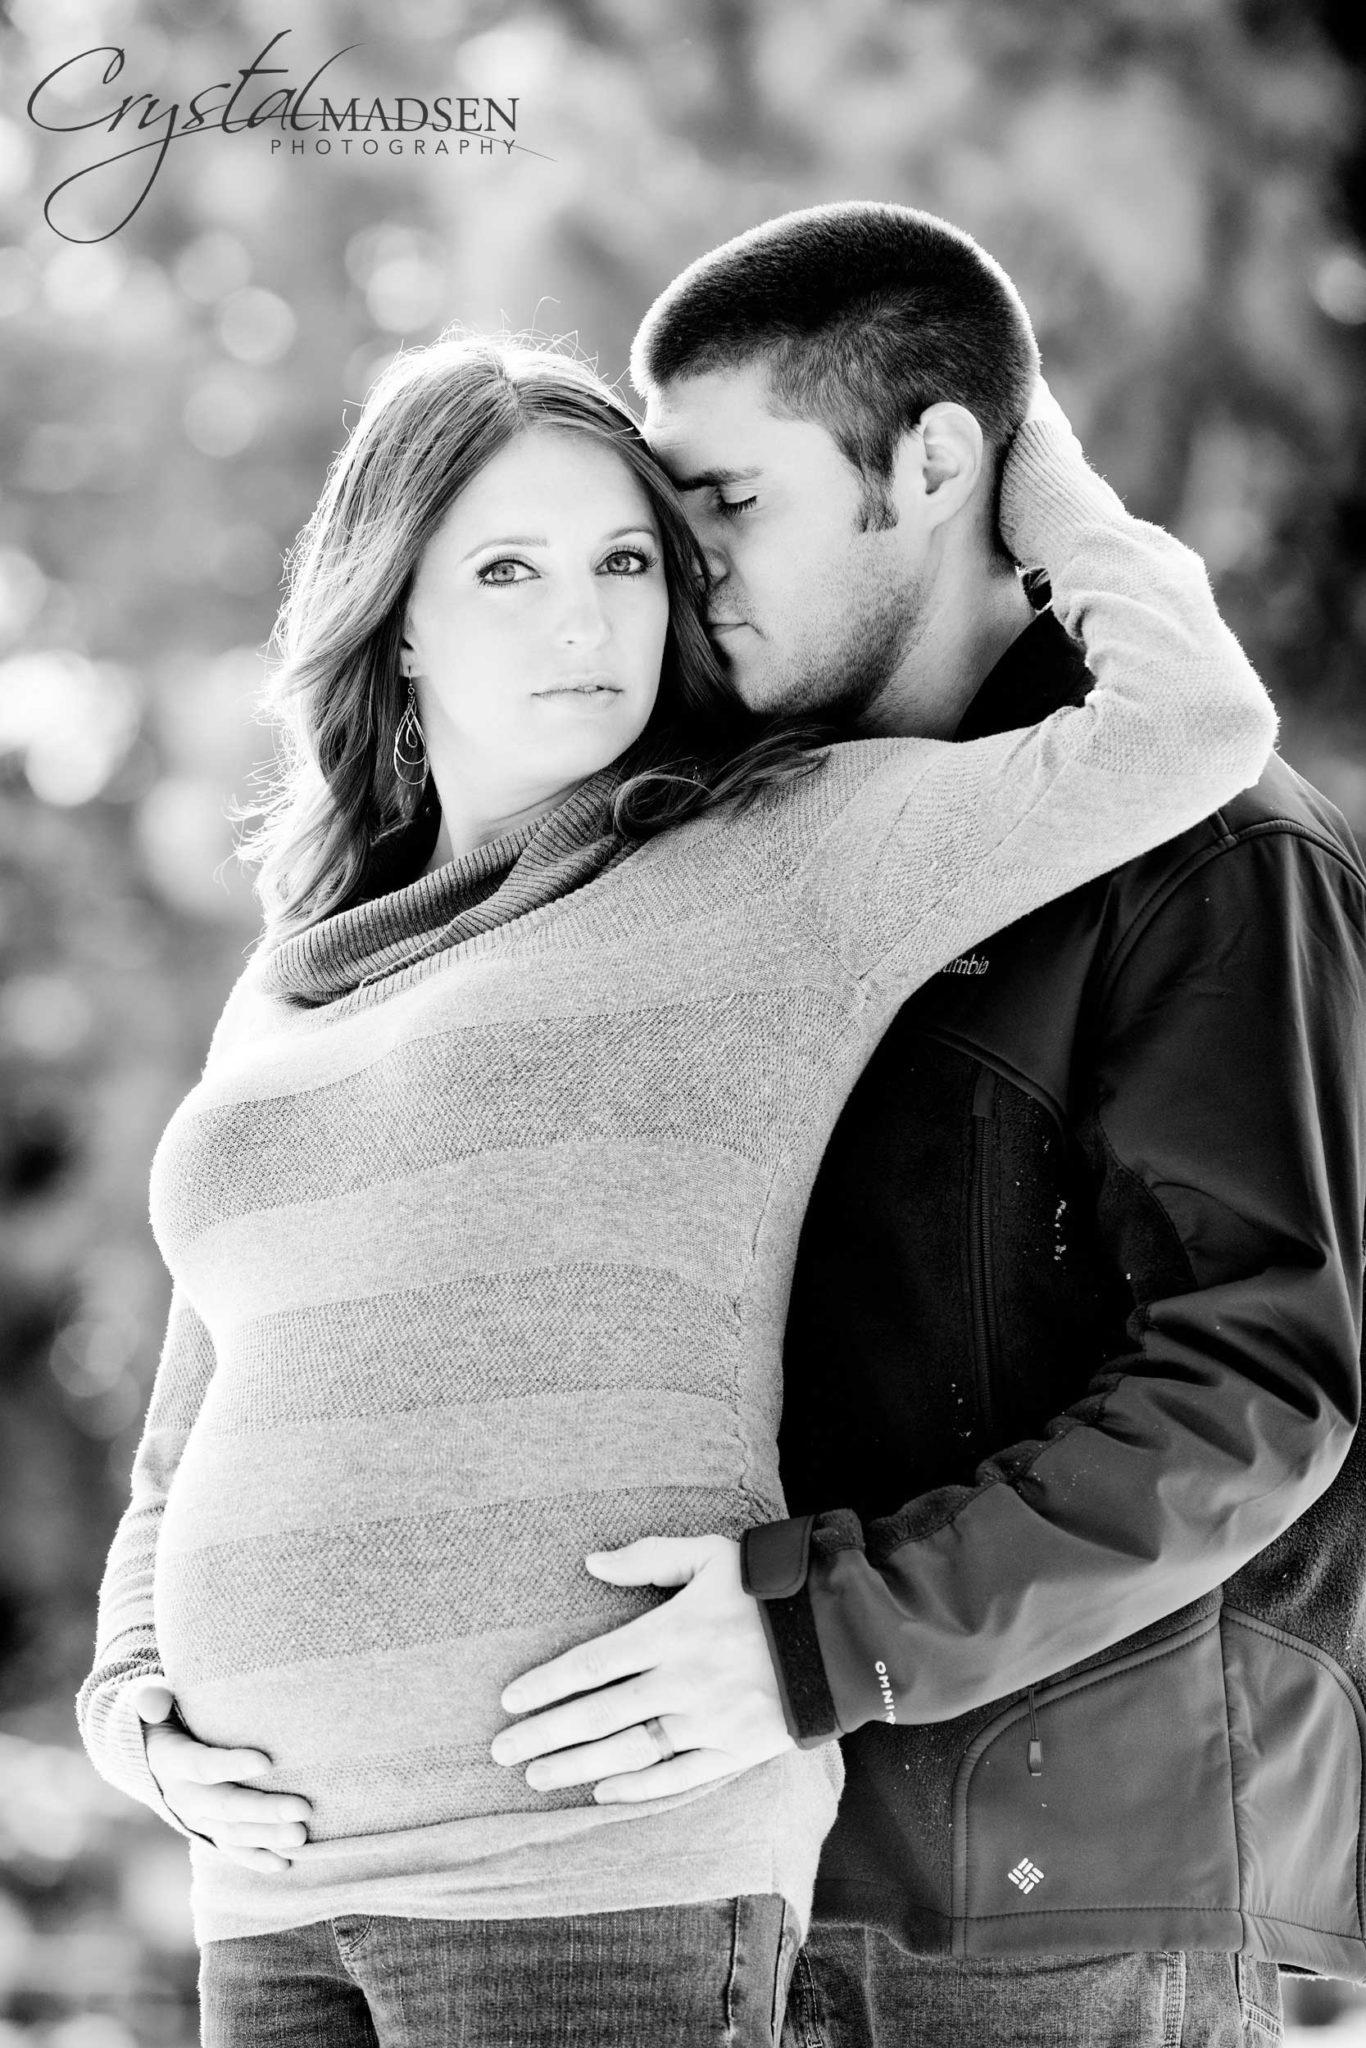 Crystal Madsen Spokane Maternity Photography